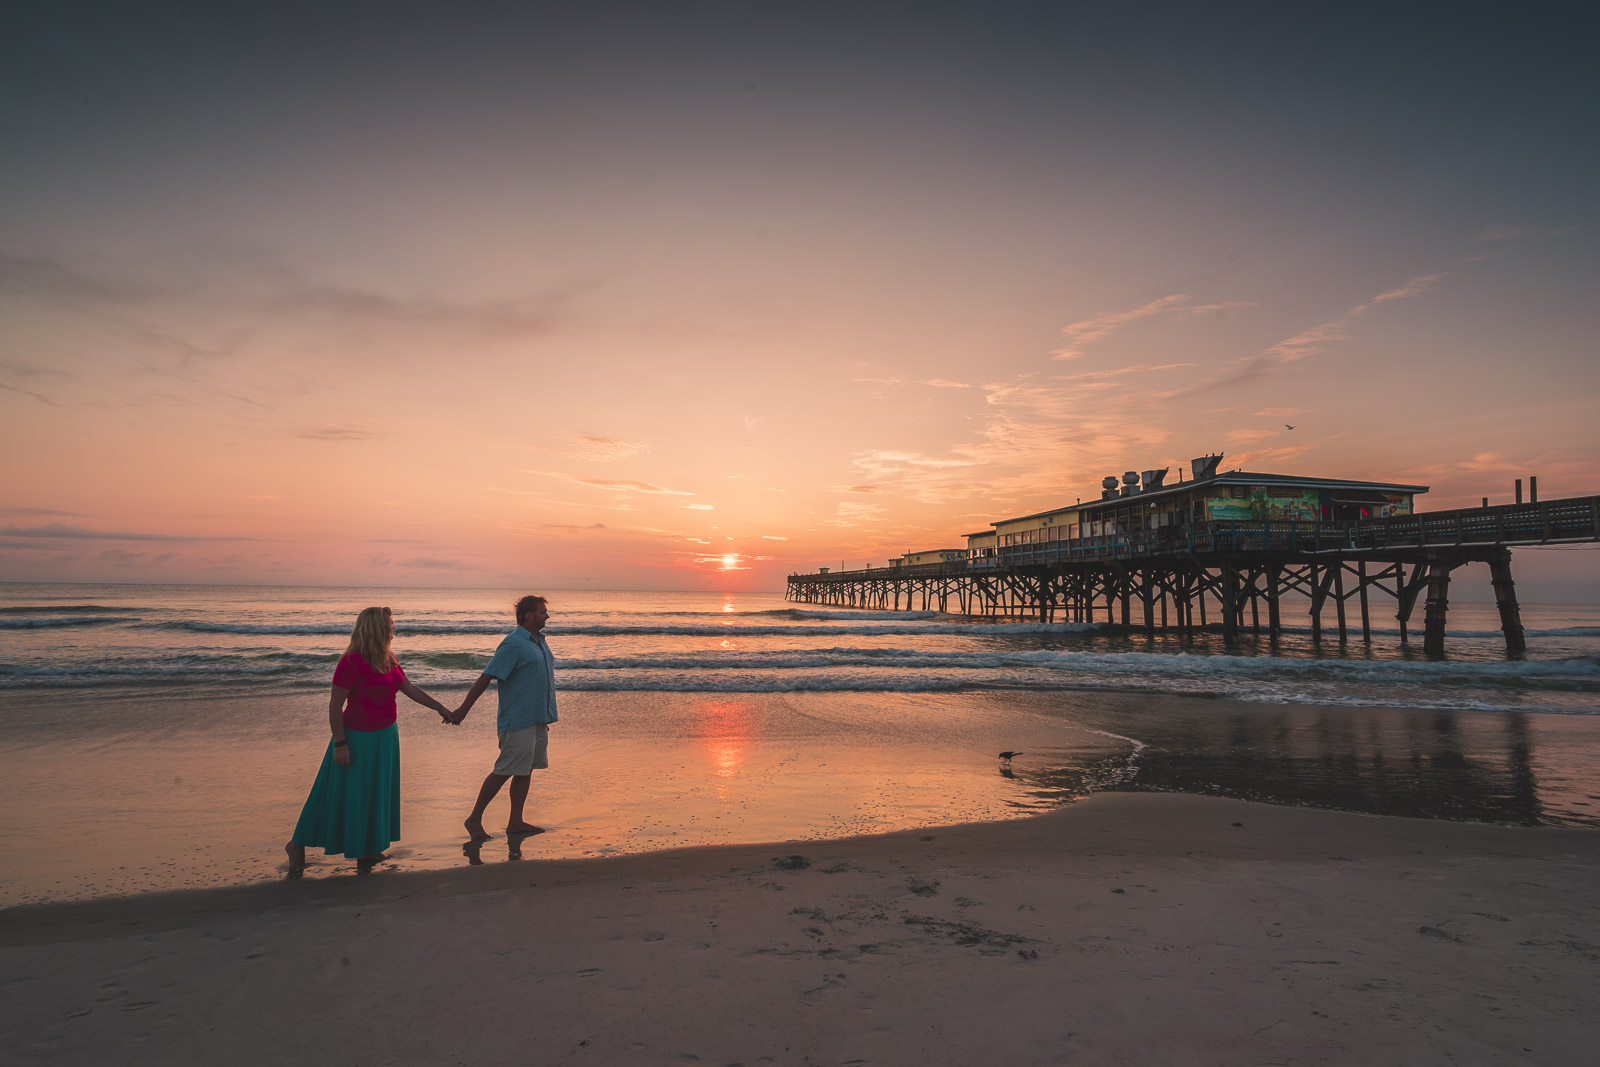 best things to do in daytona beach florida